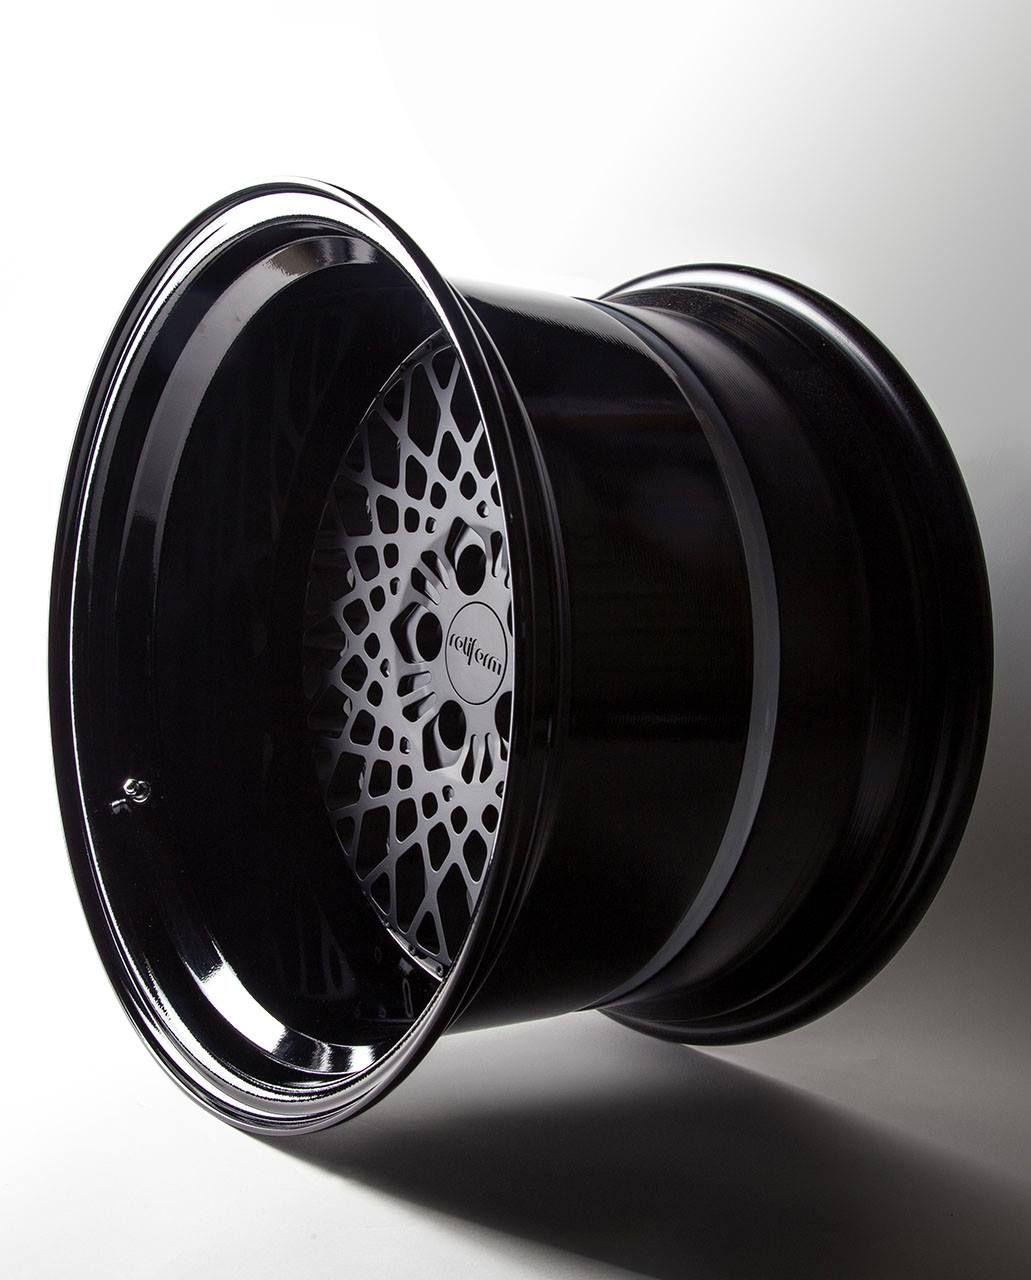 Car Tires Near Me >> Deep dish Rotiform LHR #rotiform #wheels | Wheel rims, Rims for cars, Wheels and tires